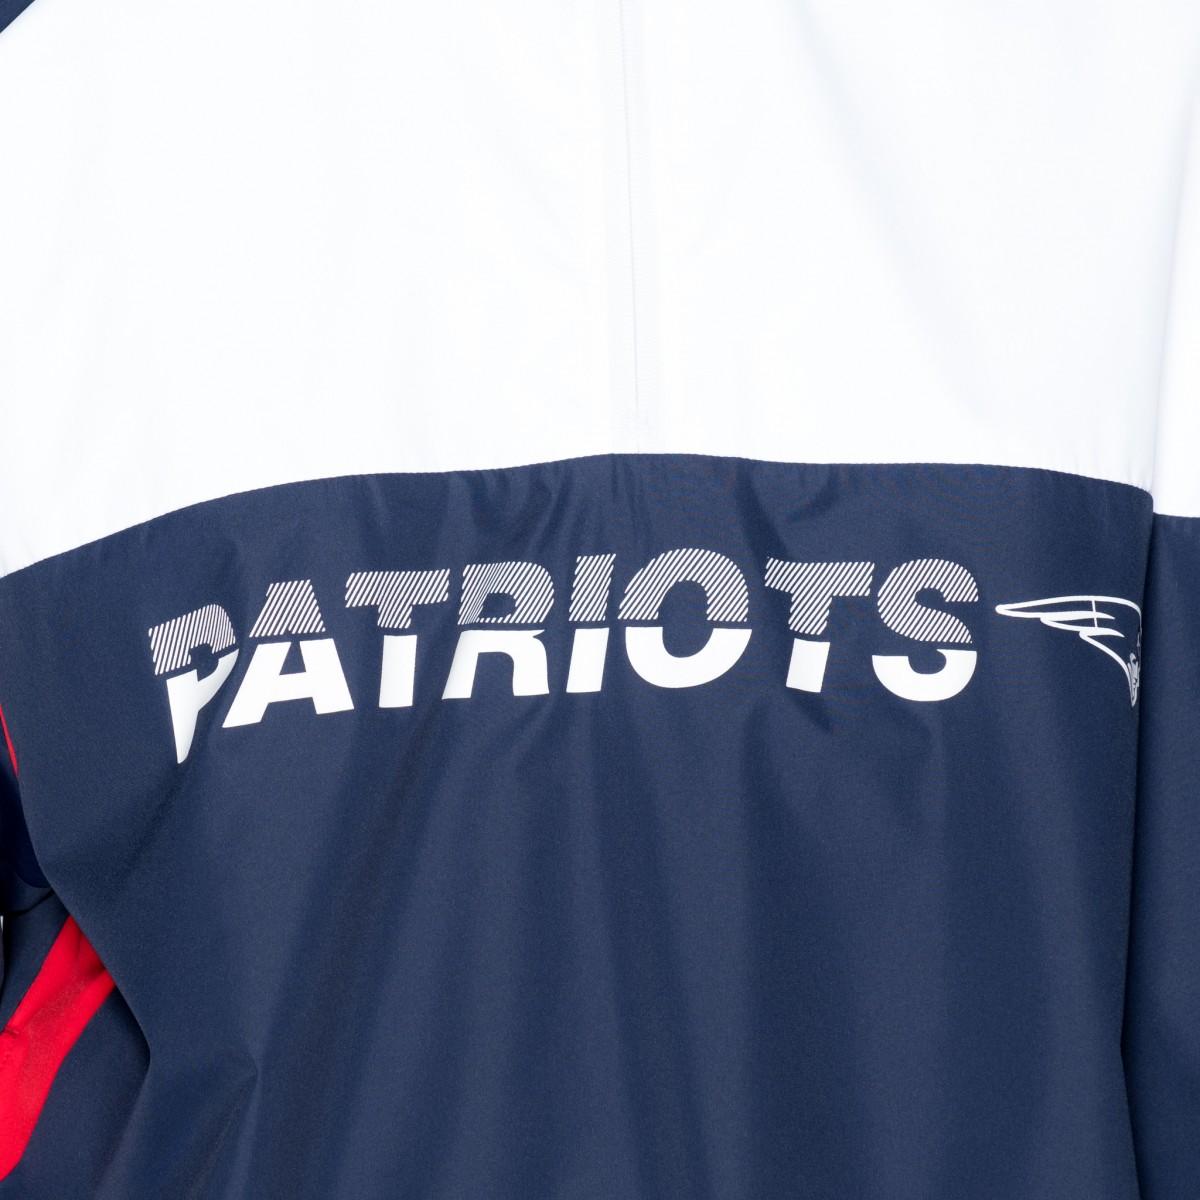 New Era England Patriots Windbreaker